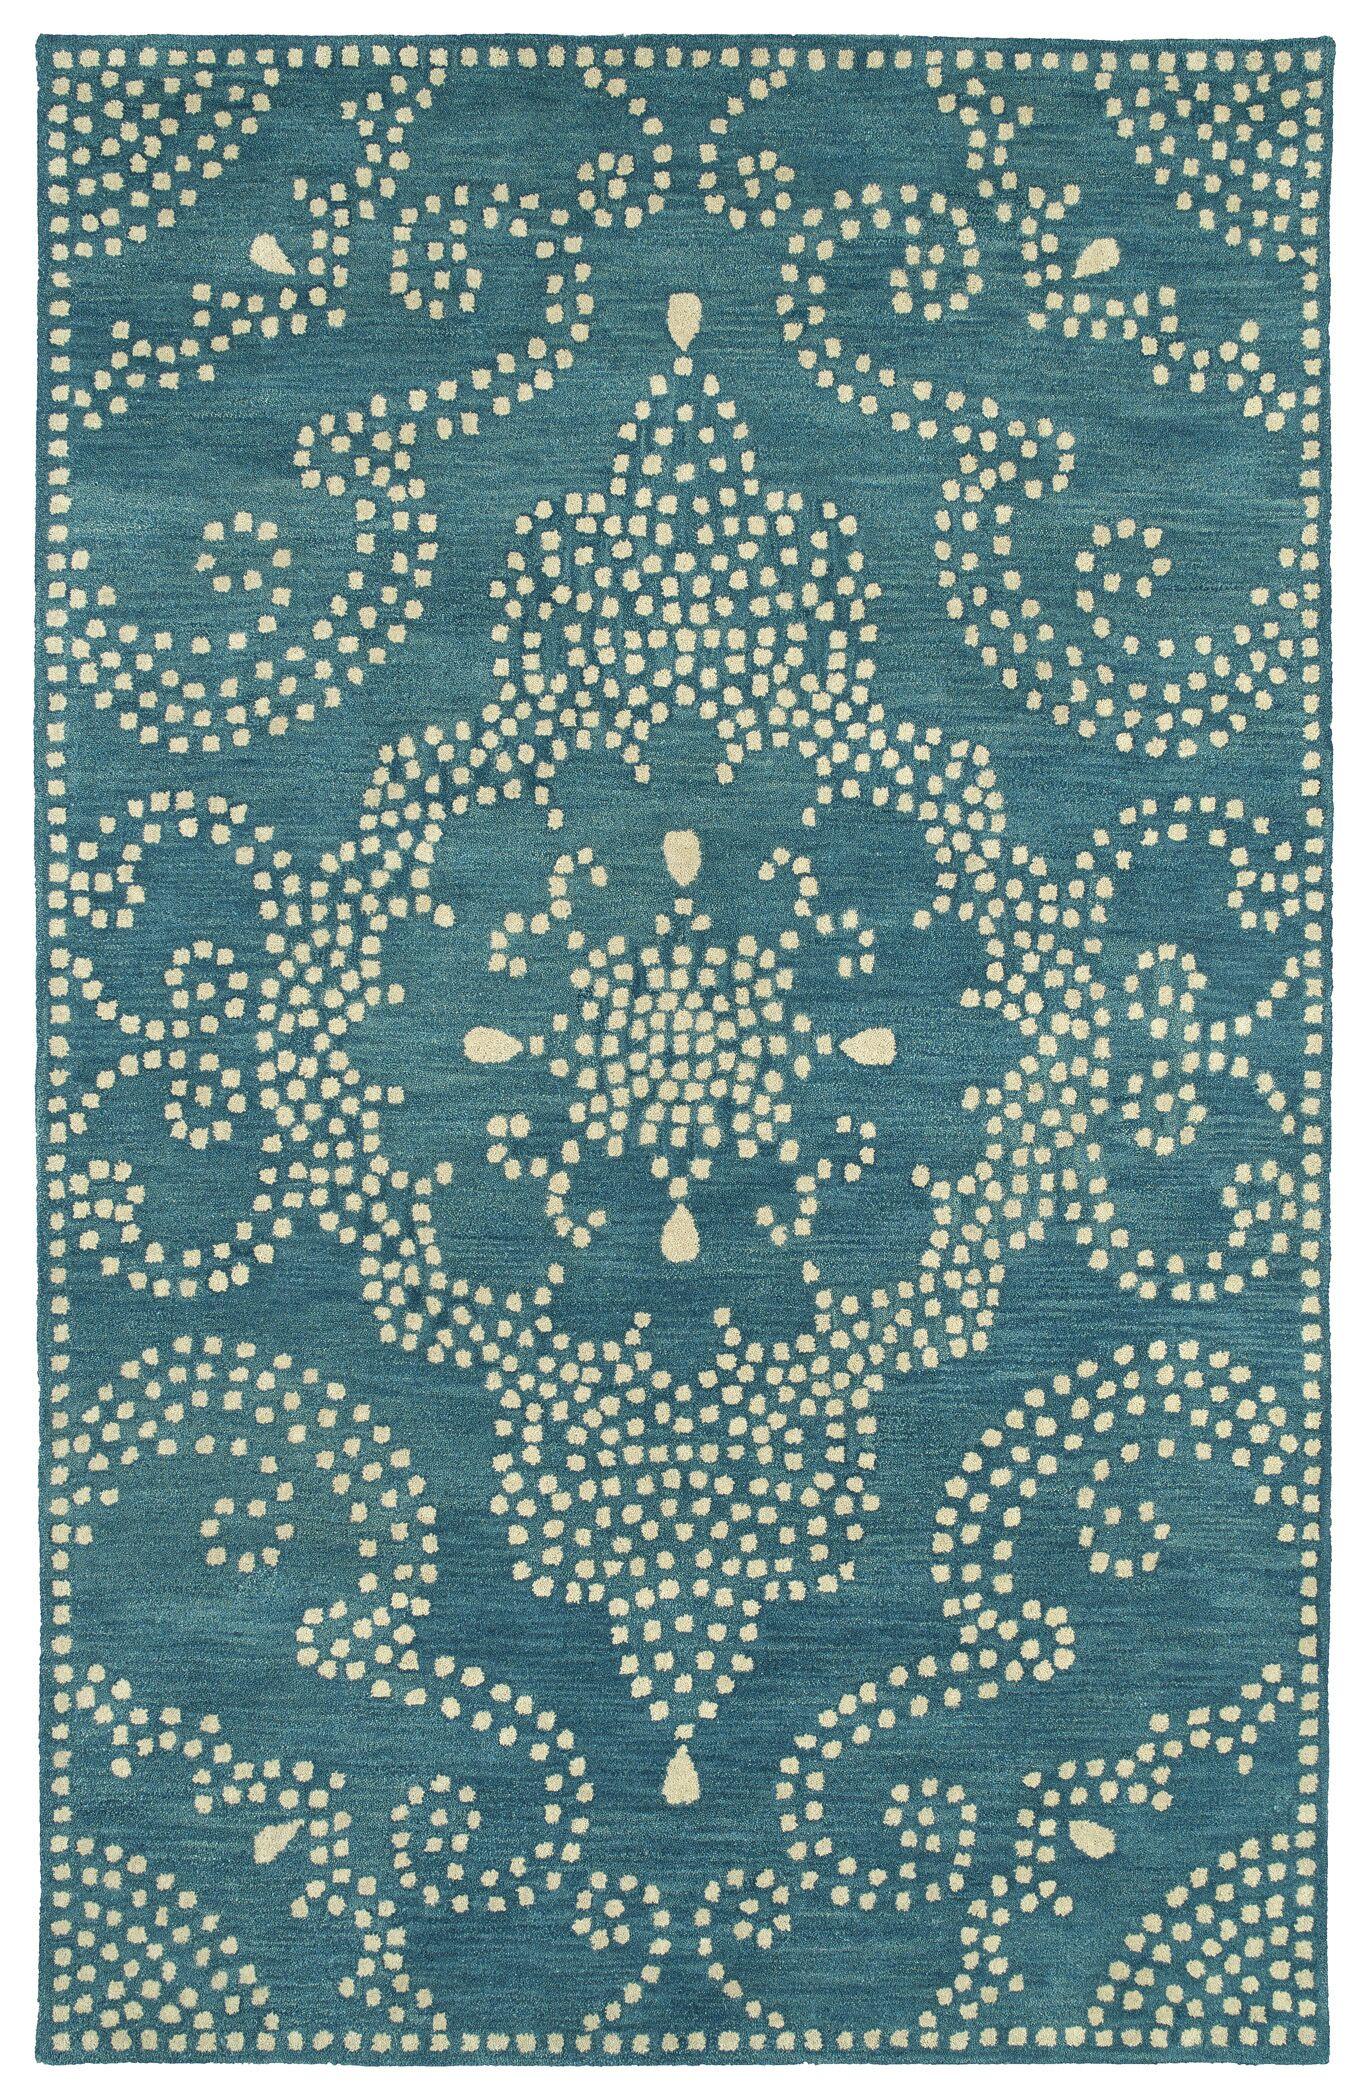 Bashford Hand Tufted Green/Beige Area Rug Rug Size: Rectangle 5' x 7'9